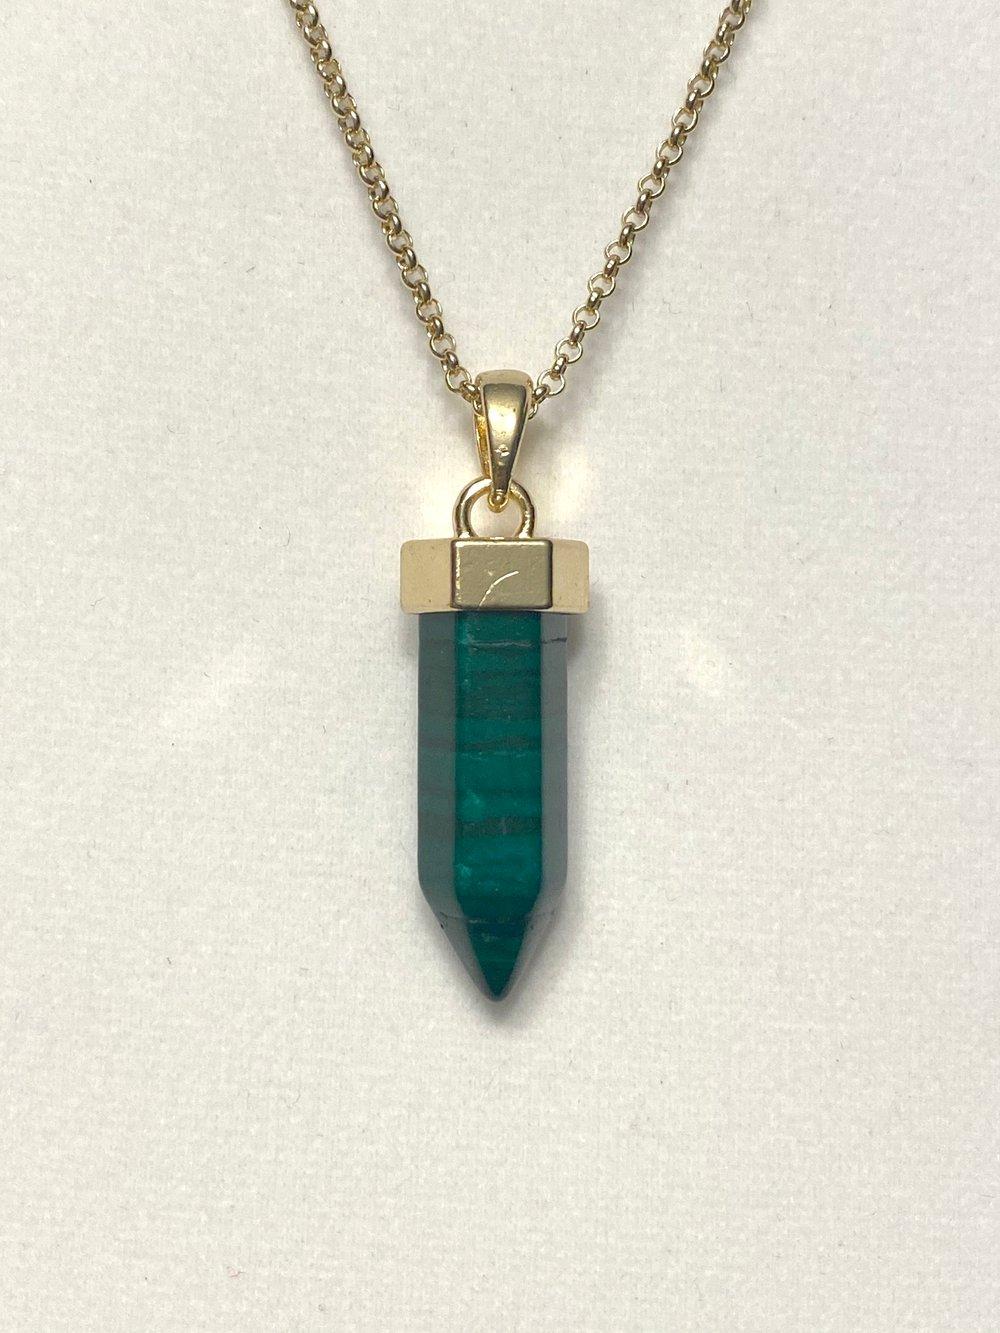 Malachite Pendant and Gold Chain Necklace